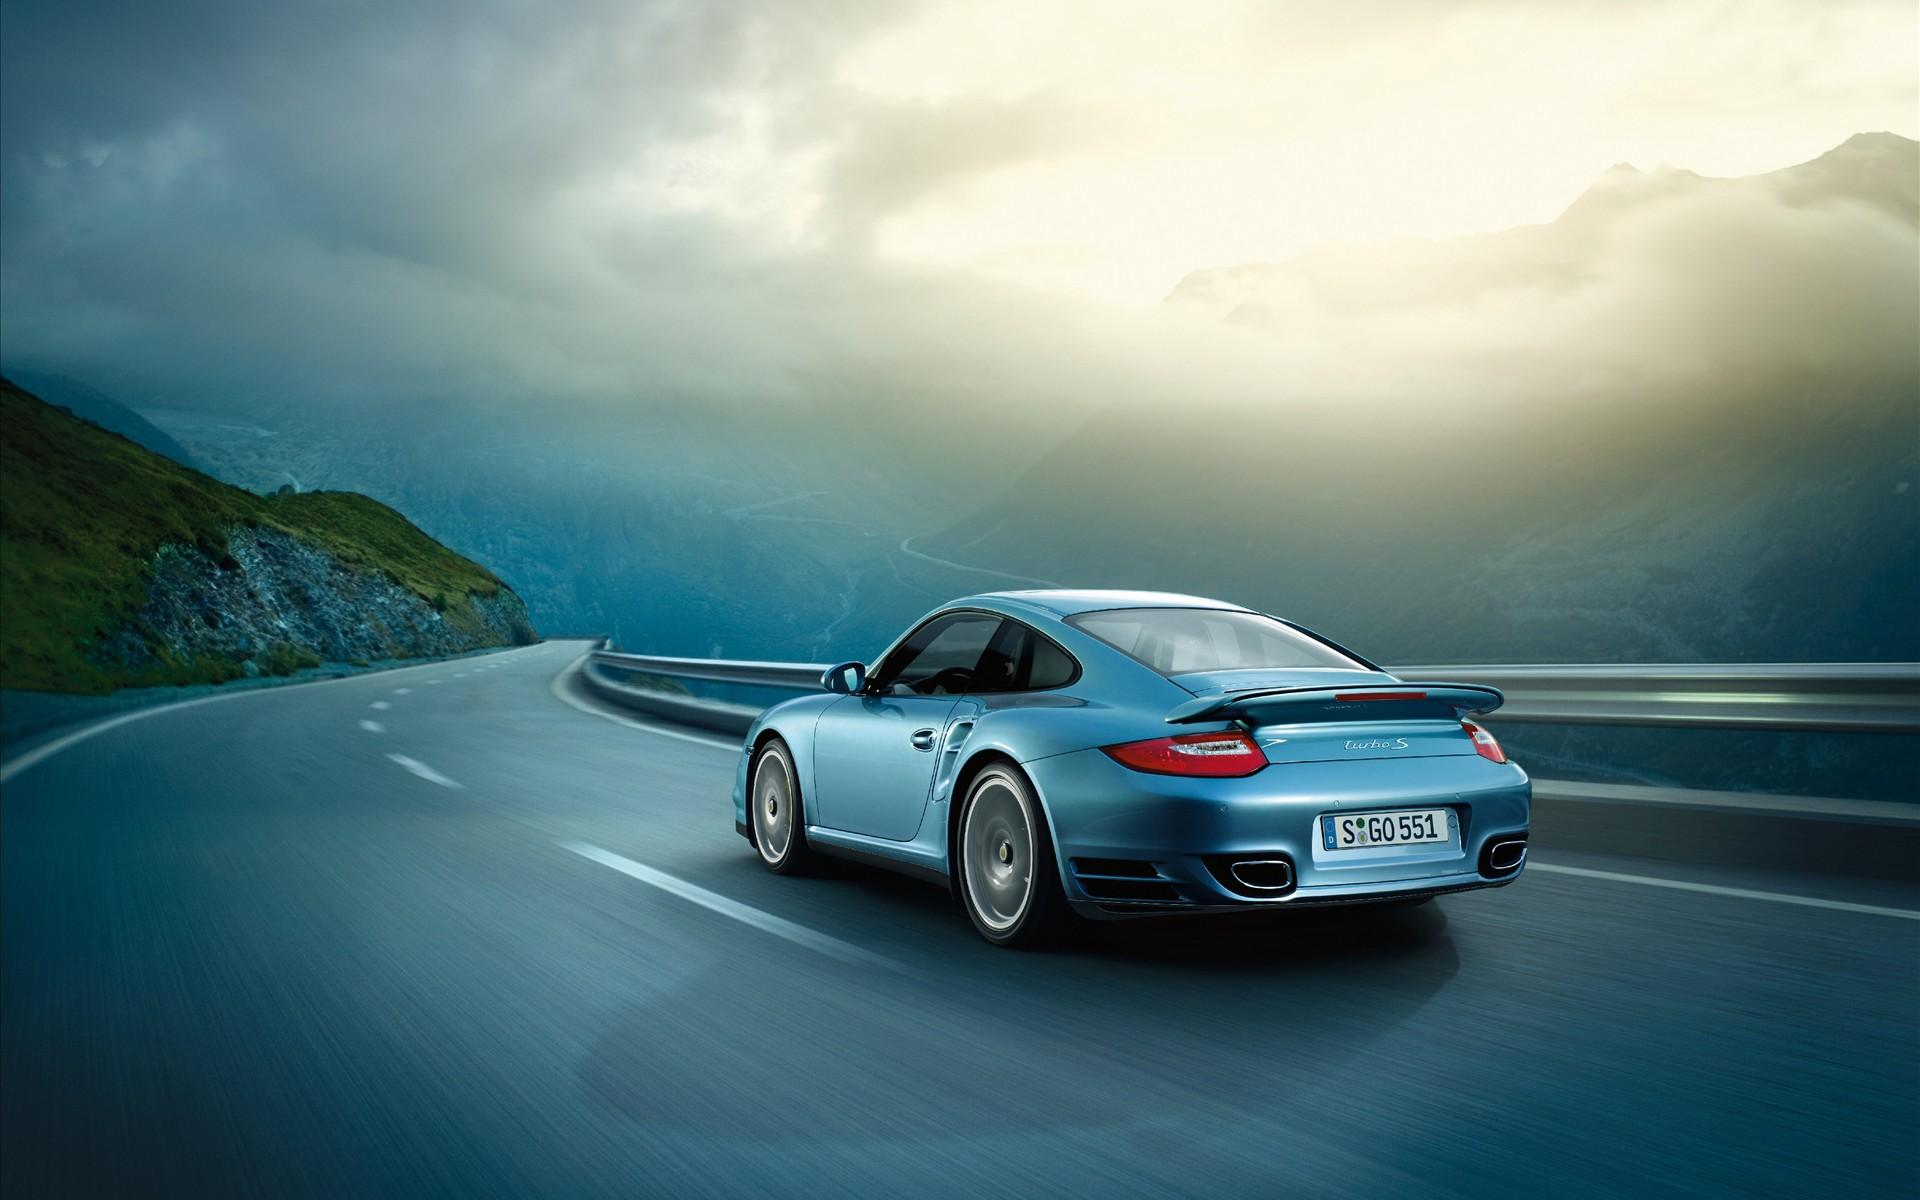 2011 Porsche 911 Turbo S 2 Wallpapers HD Wallpapers 1920x1200